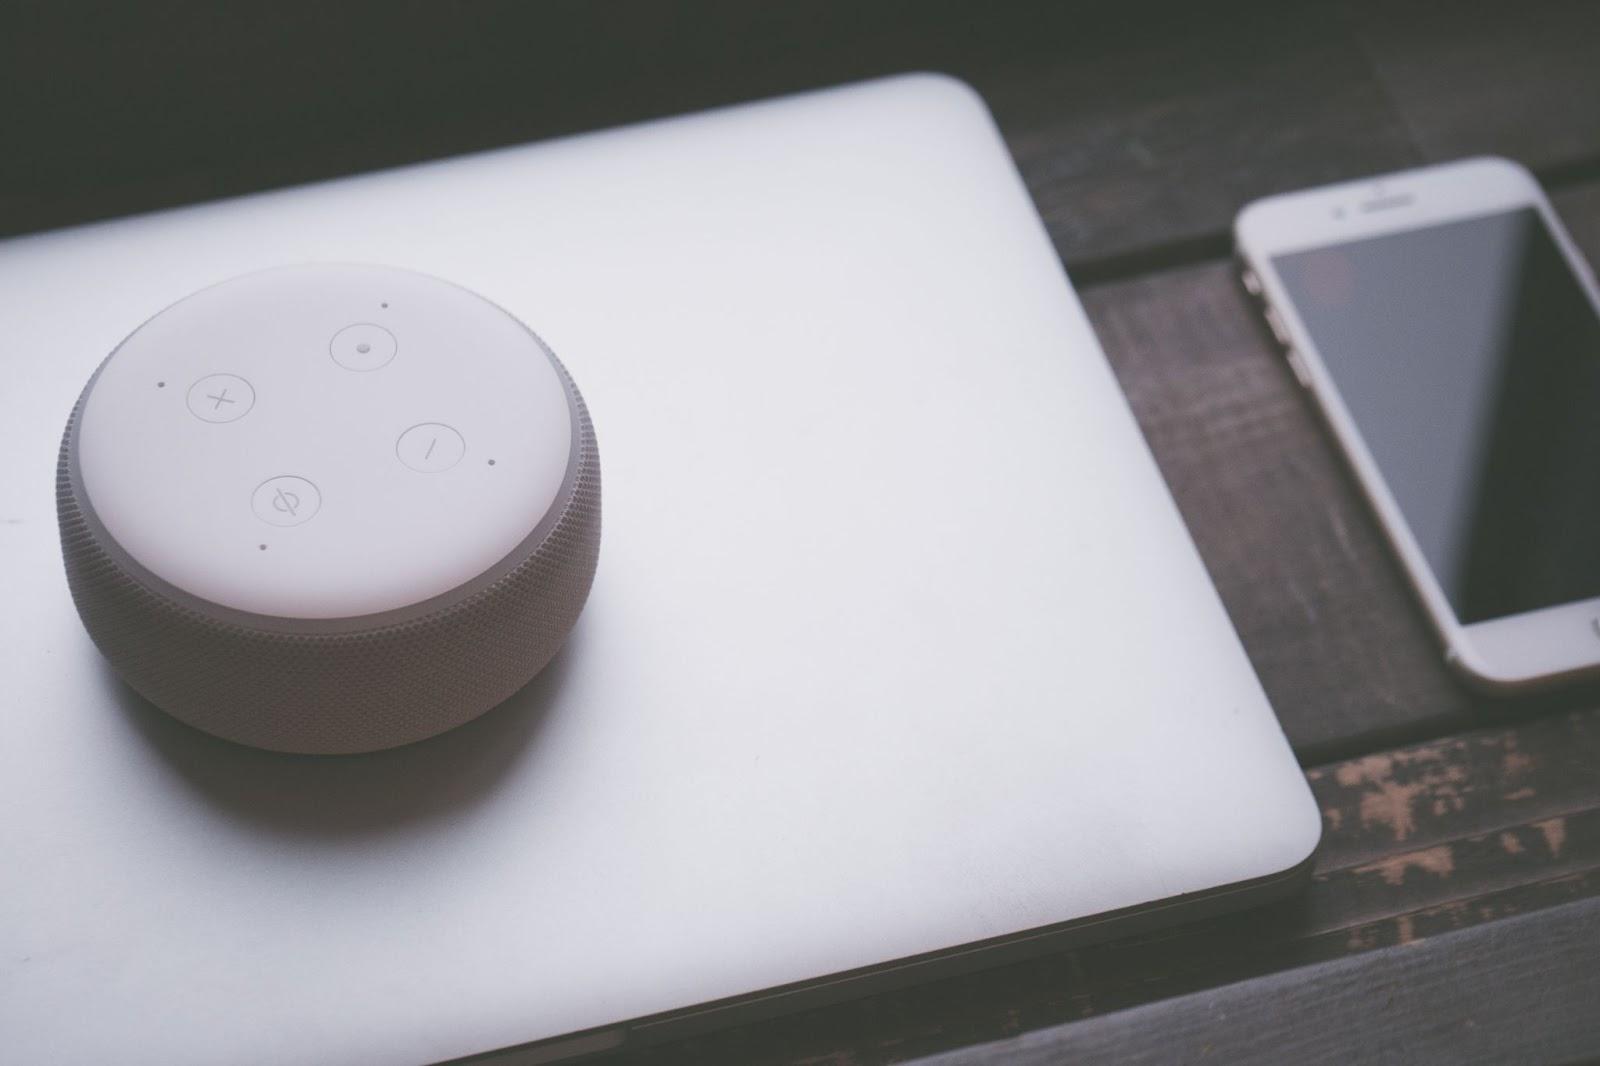 Amazon Alexa speaker sitting on a white desk.